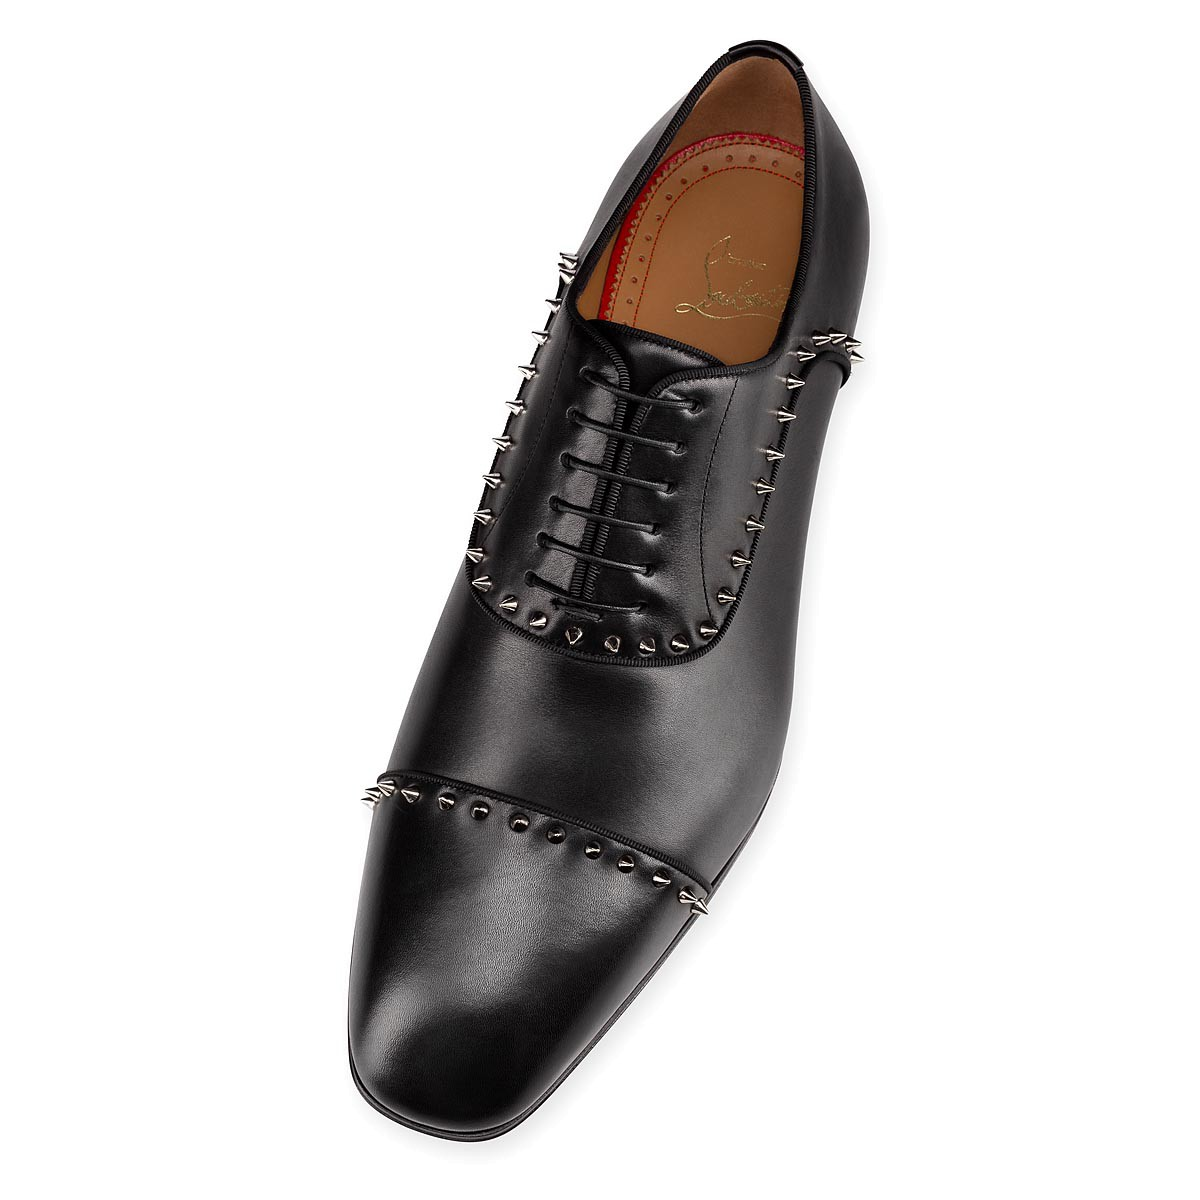 Shoes - Eton - Christian Louboutin